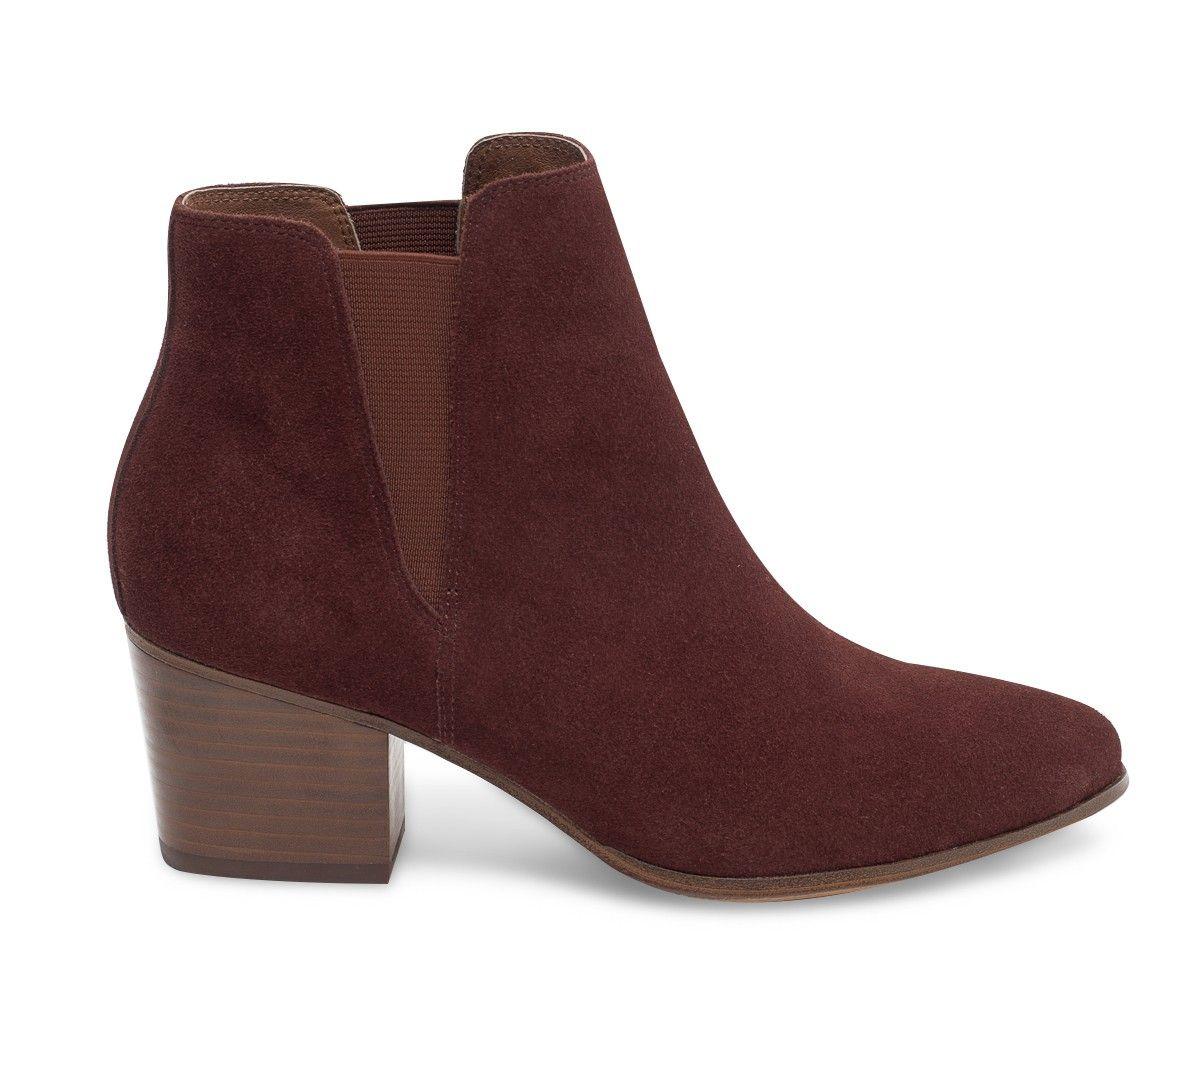 marronShoesSemelle talon marronShoesSemelle cuir cuir Boots élastiqué élastiqué Boots talon 8yvwOm0NnP